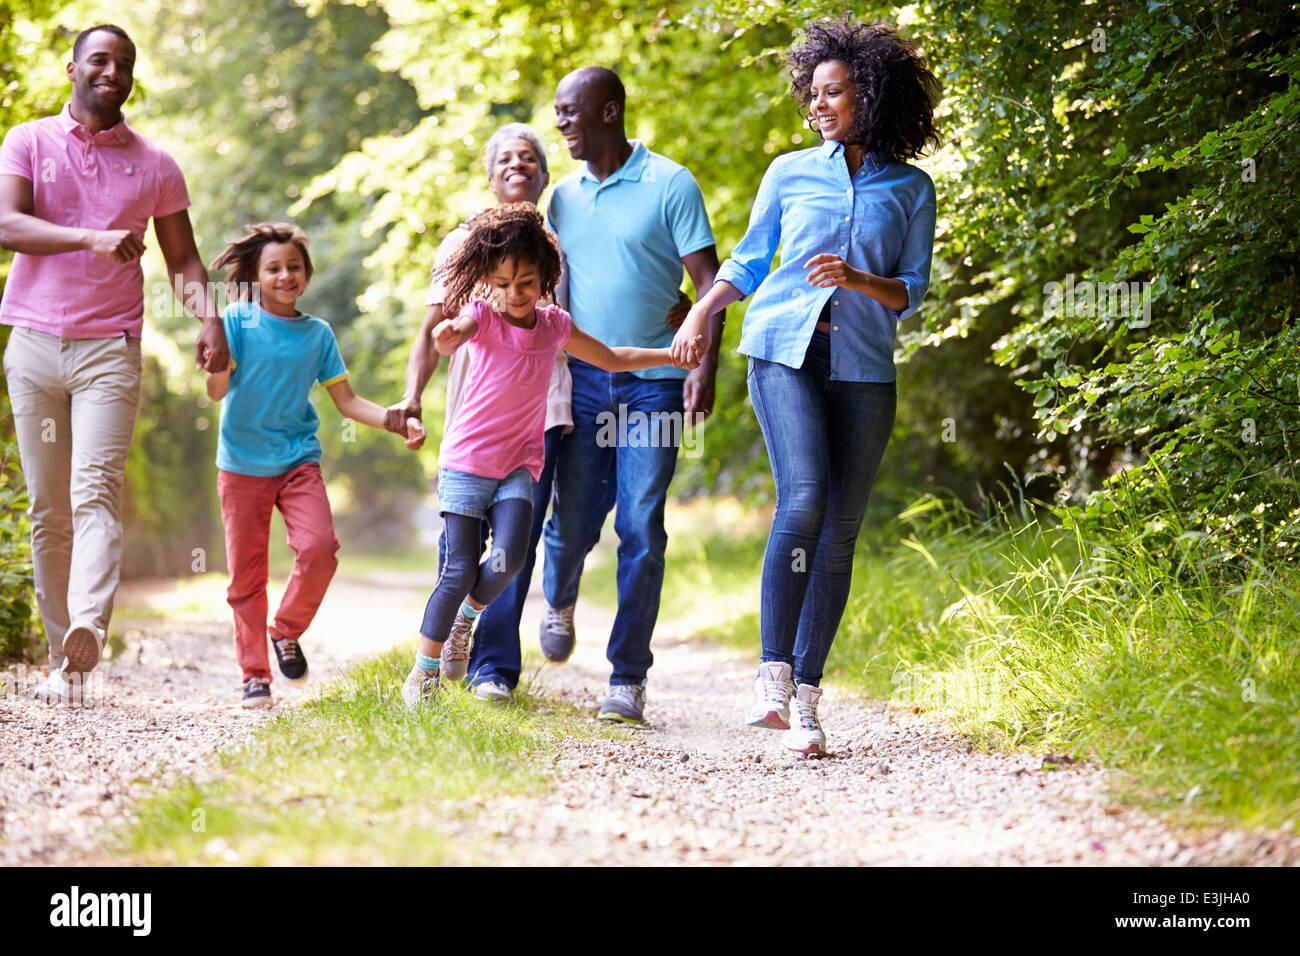 Multi generazione famiglia americana africana sul paese a piedi Immagini Stock